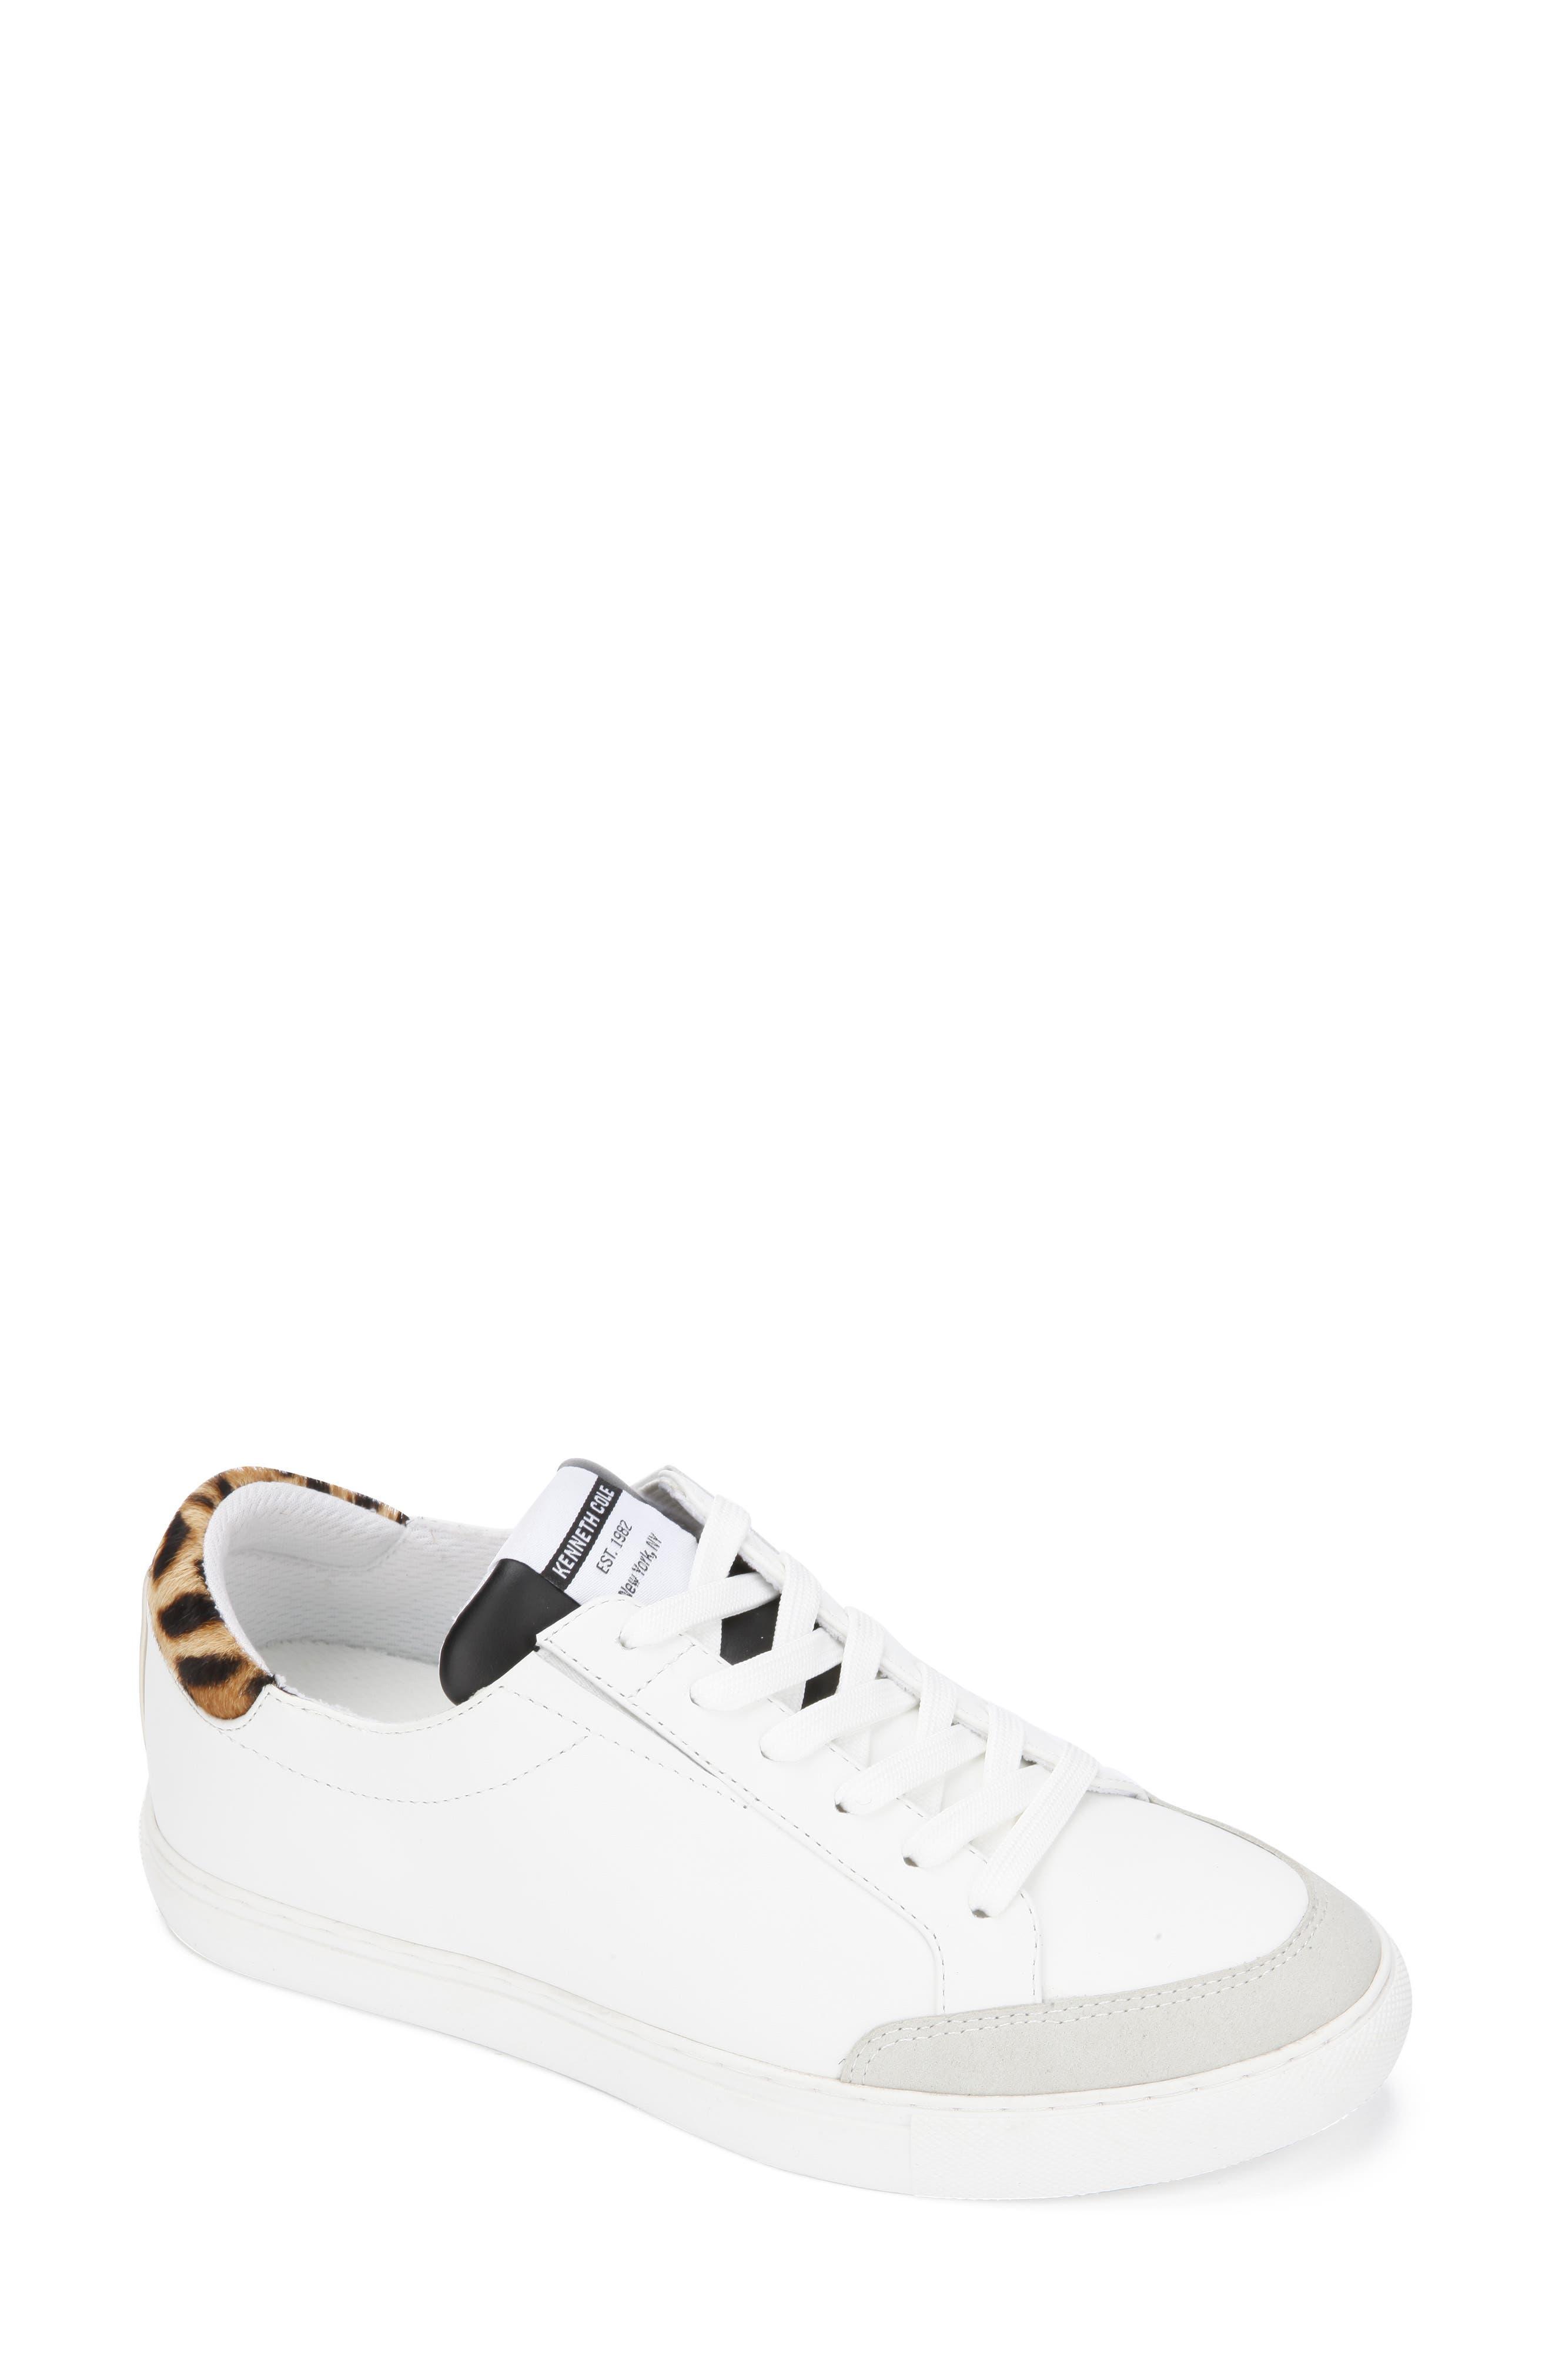 Kam Guard Eo Sneaker